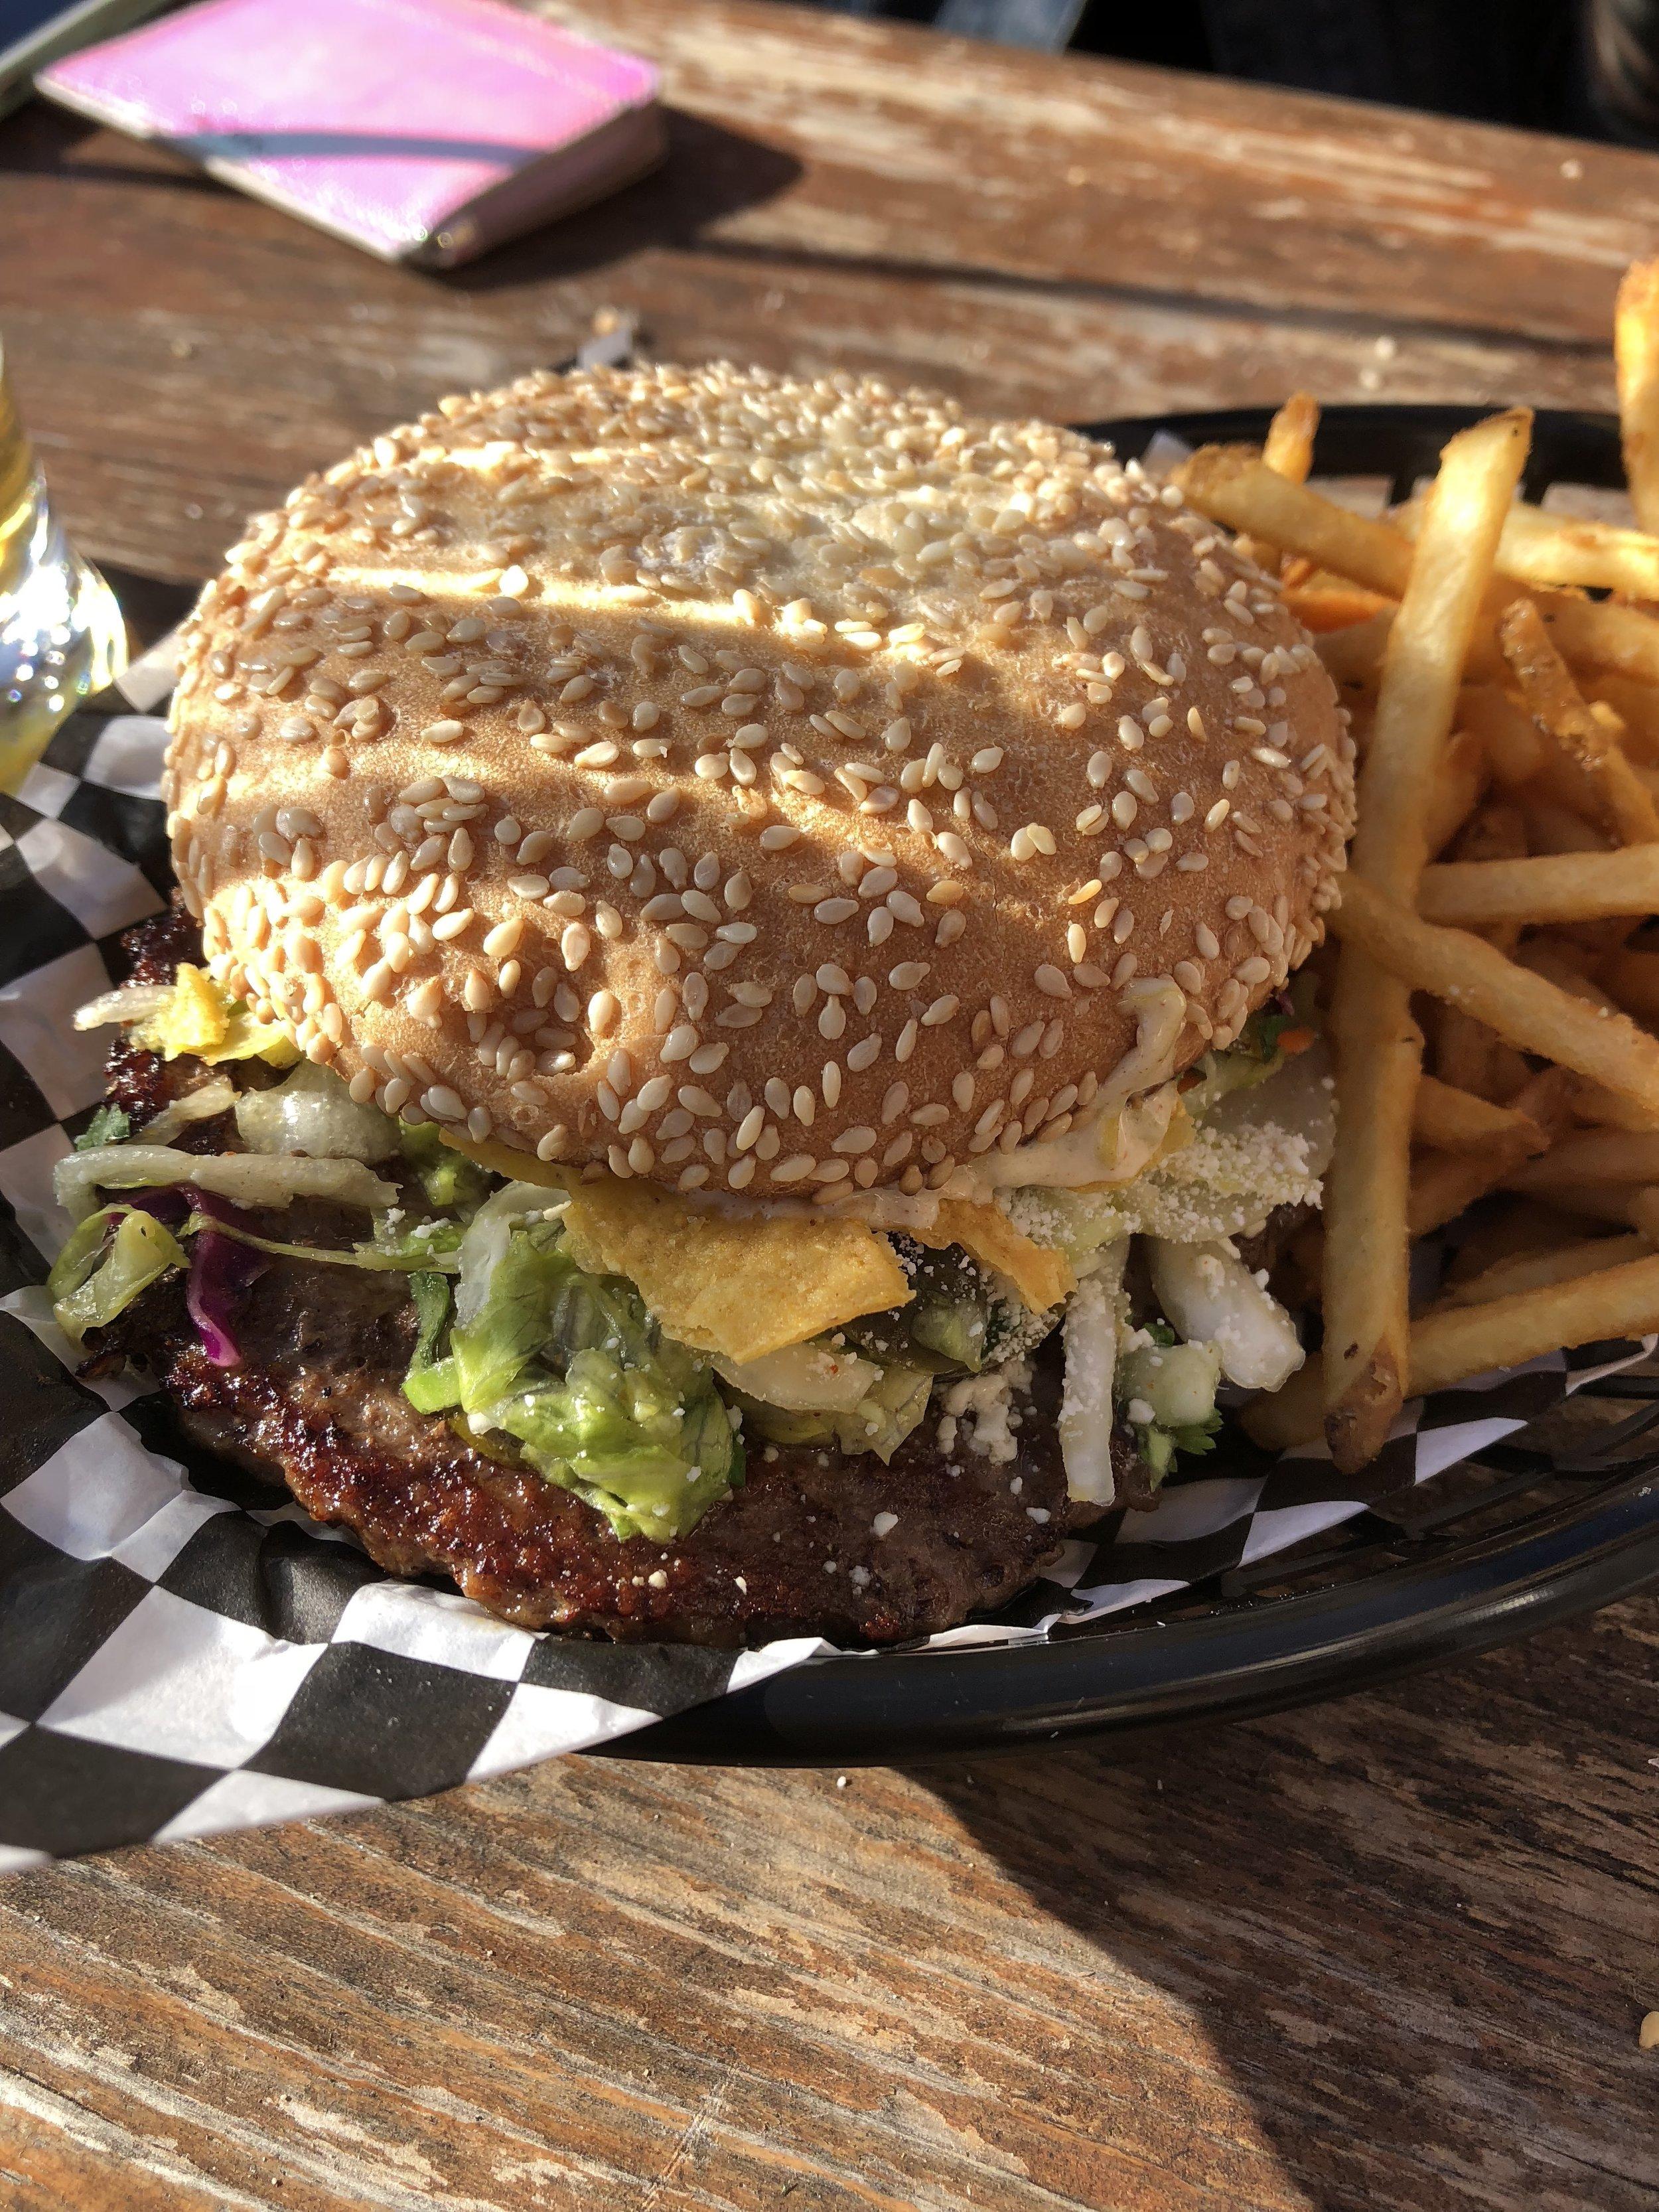 Day Three: Peak Performance — I Had The Burger